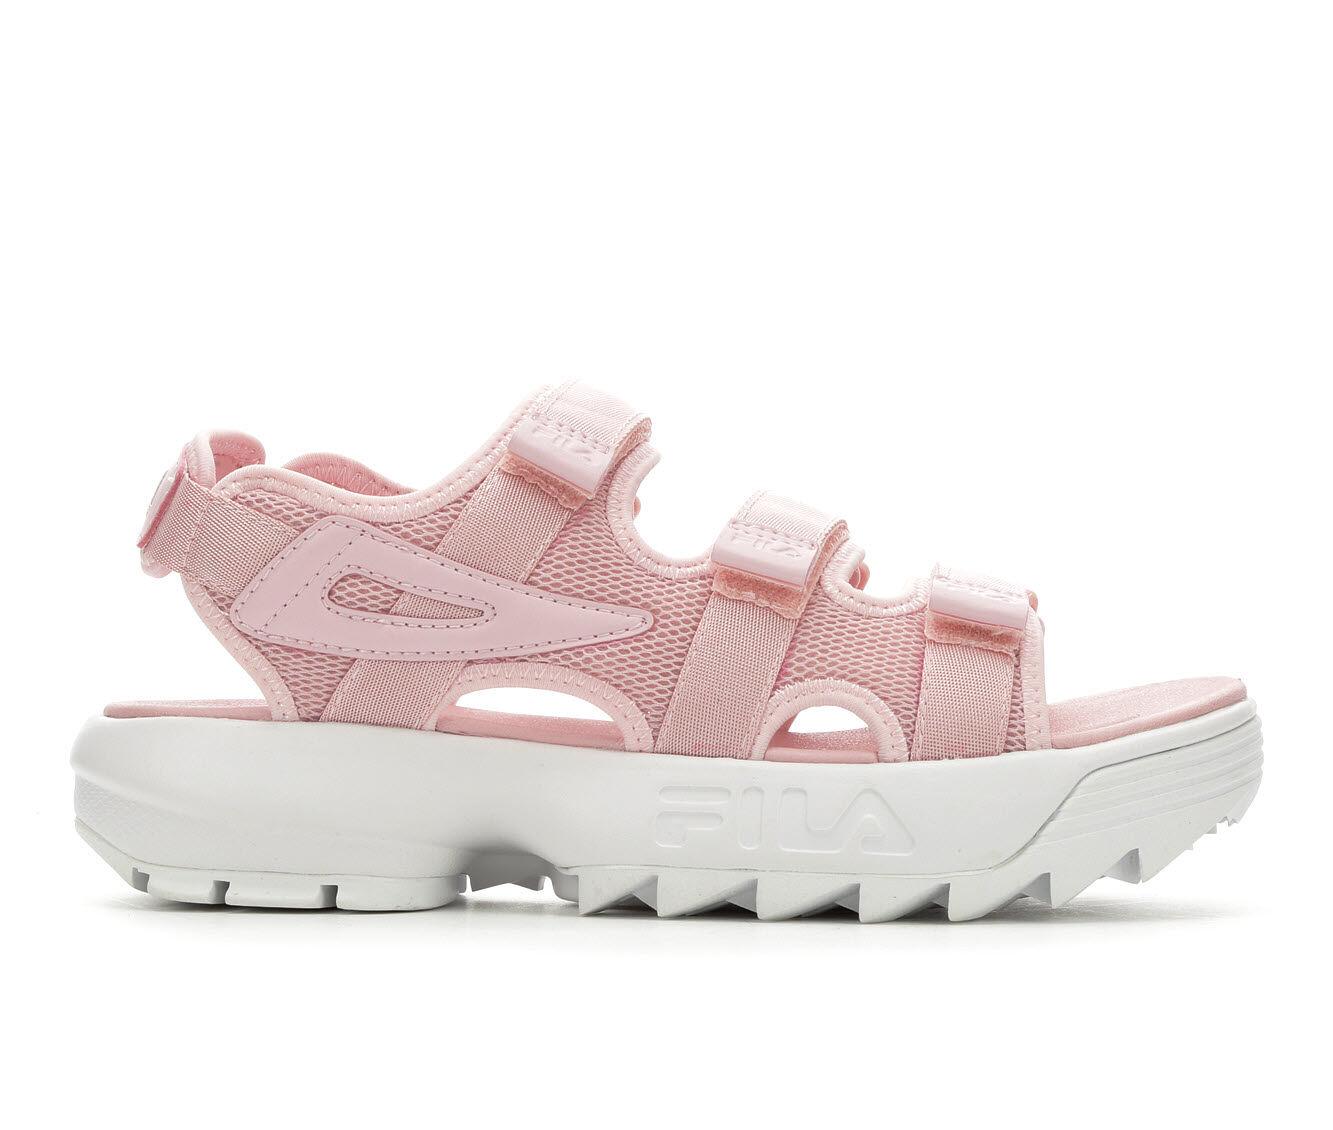 Women's Fila Disruptor Sandal Flatform Sandals Chalk Pink/Whit